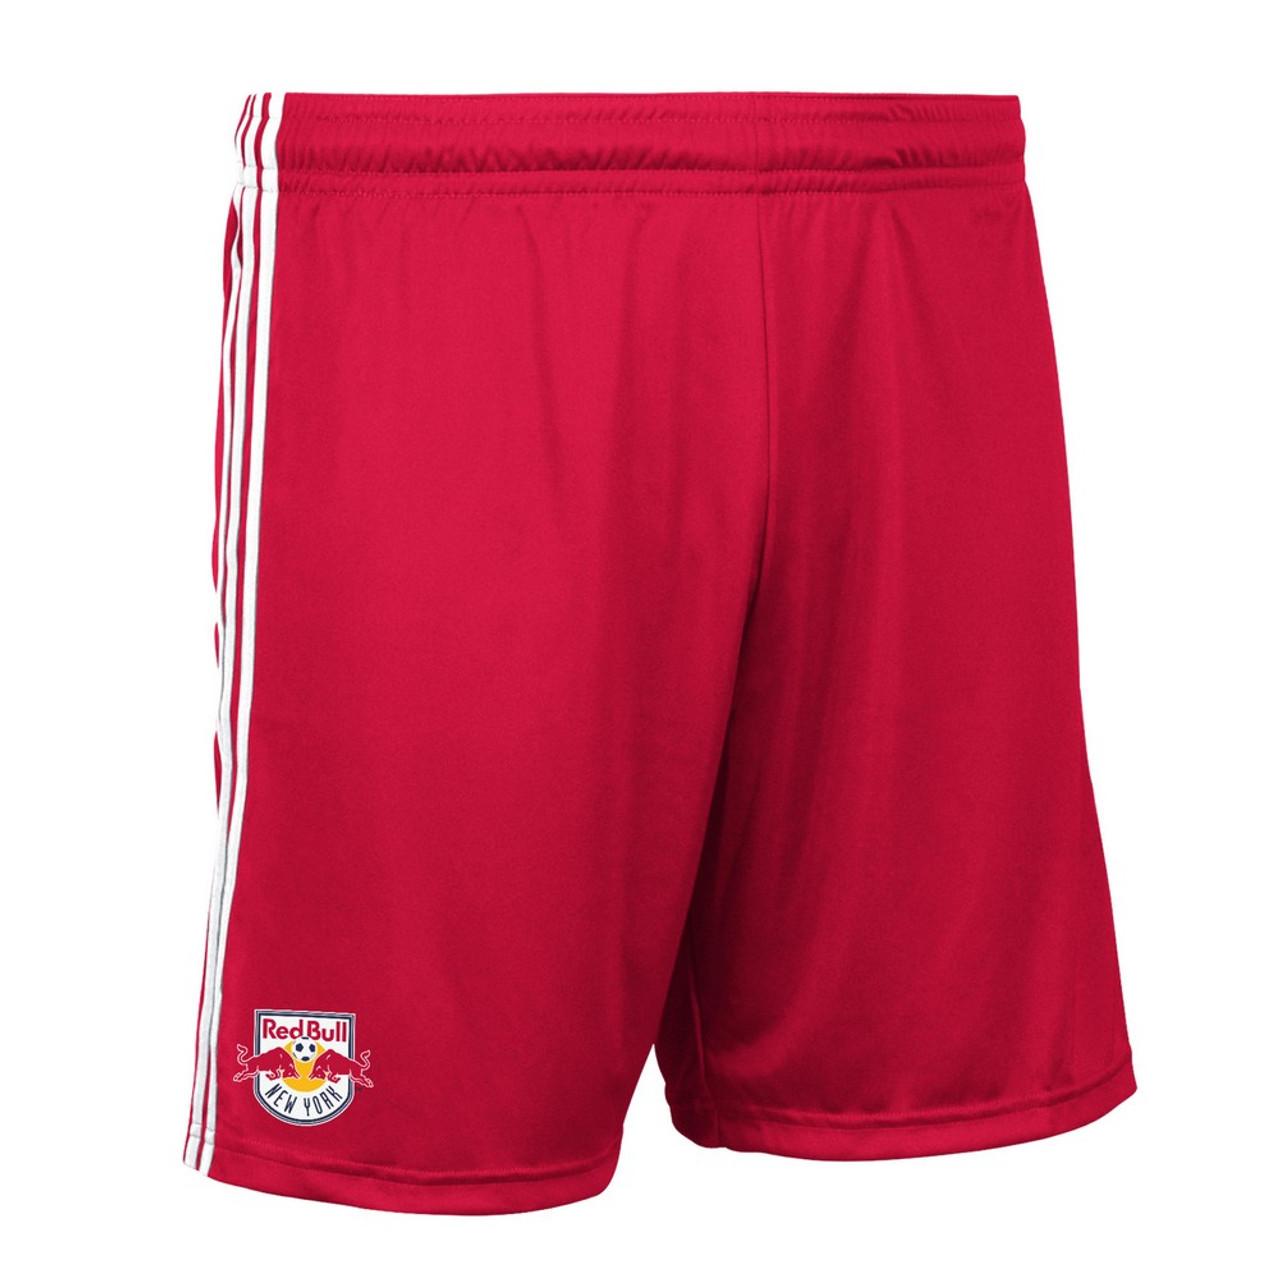 New York Red Bulls Shorts Replica Adidas Soccer Shorts